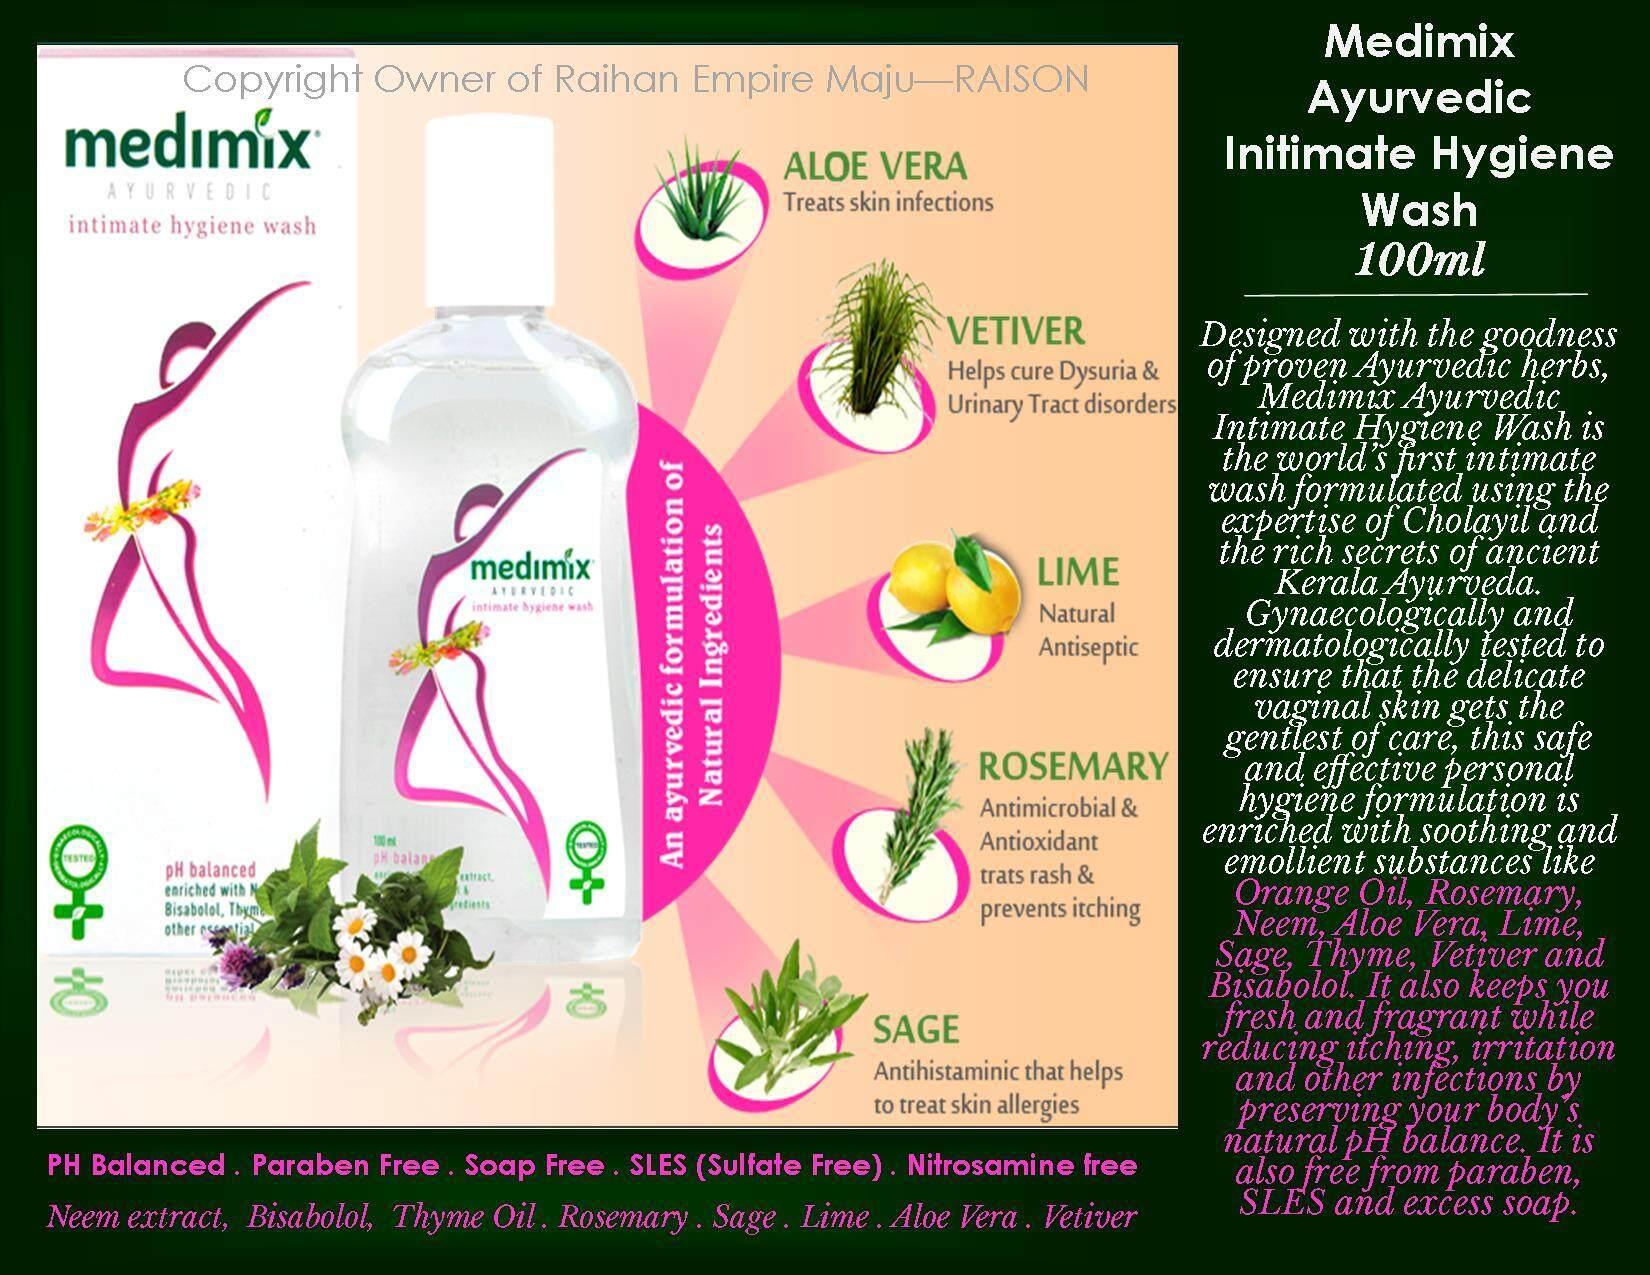 Medimix Ayurvedic Initimate Hygiene Wash 100ml By Raison- Raihan Maju Empire.